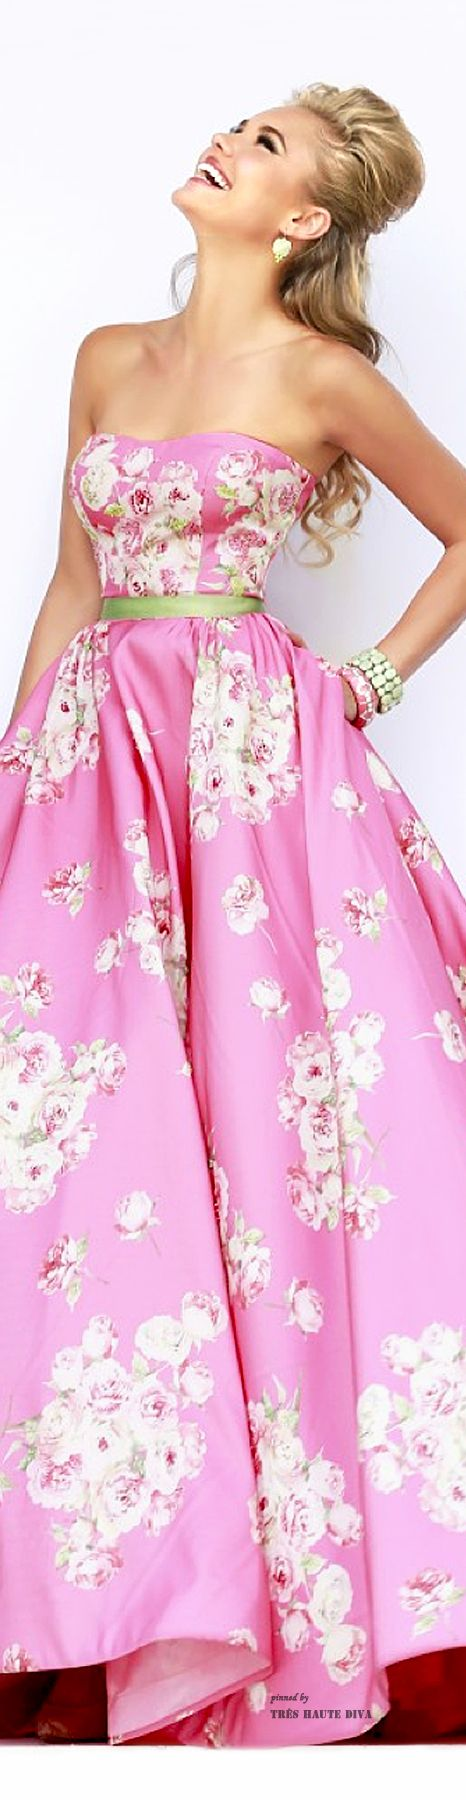 Sherri Hill | Dresses | Pinterest | Rosas, Vestiditos y Blanco